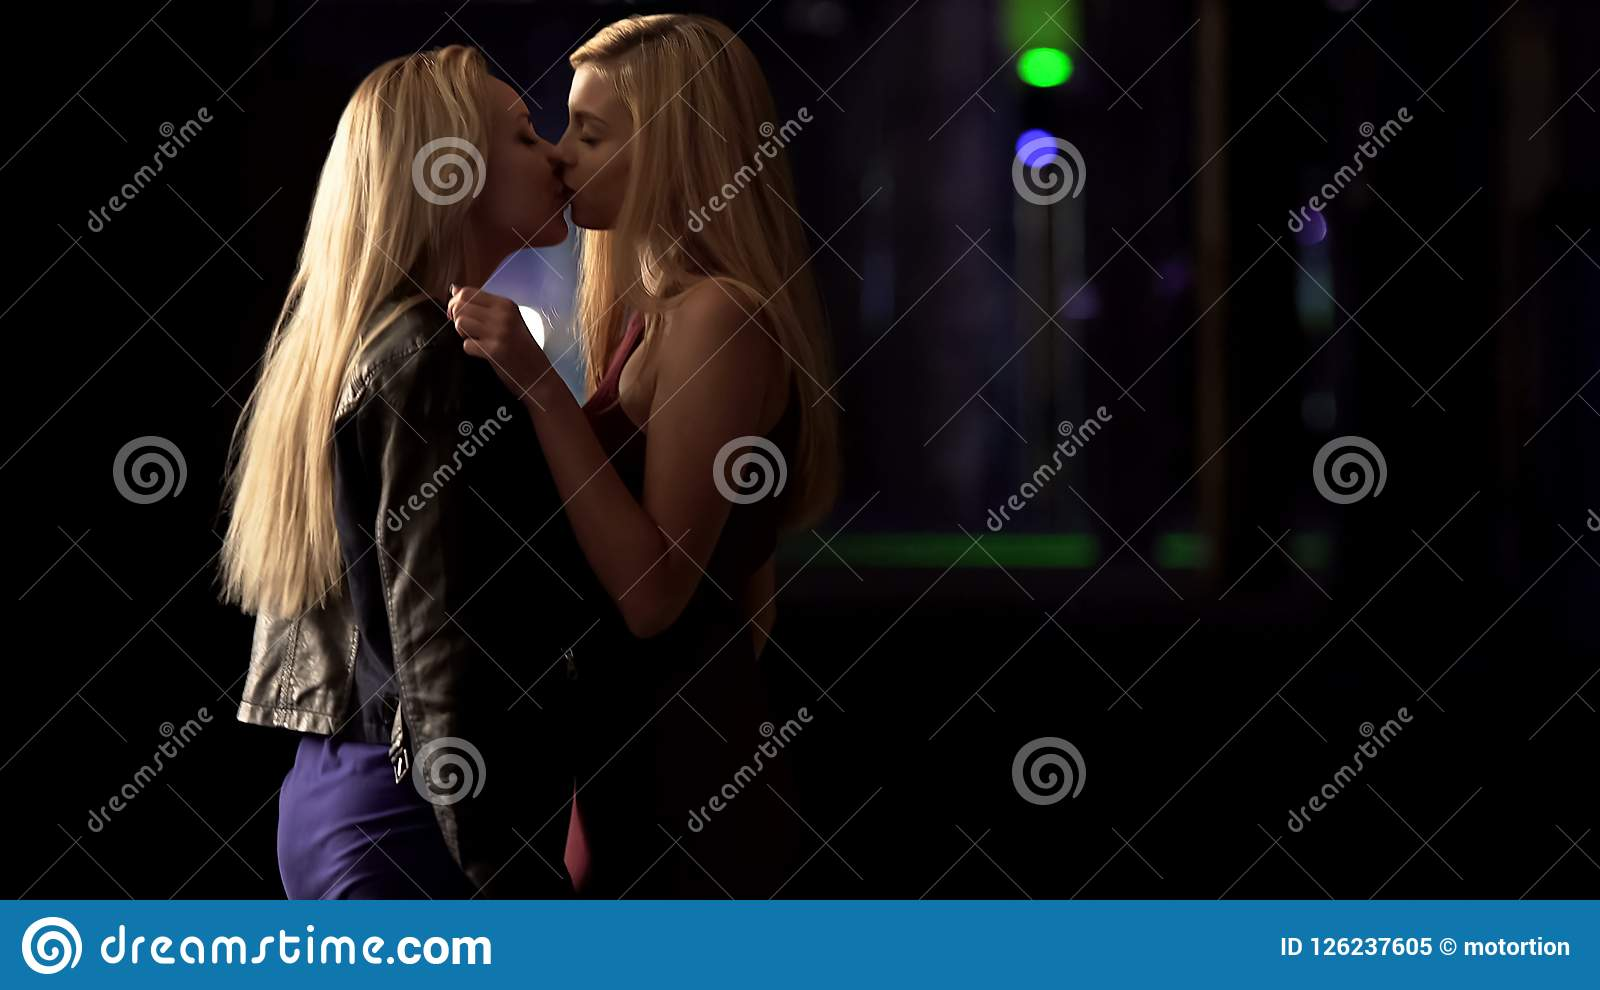 Big Ass Lesbian Kissing